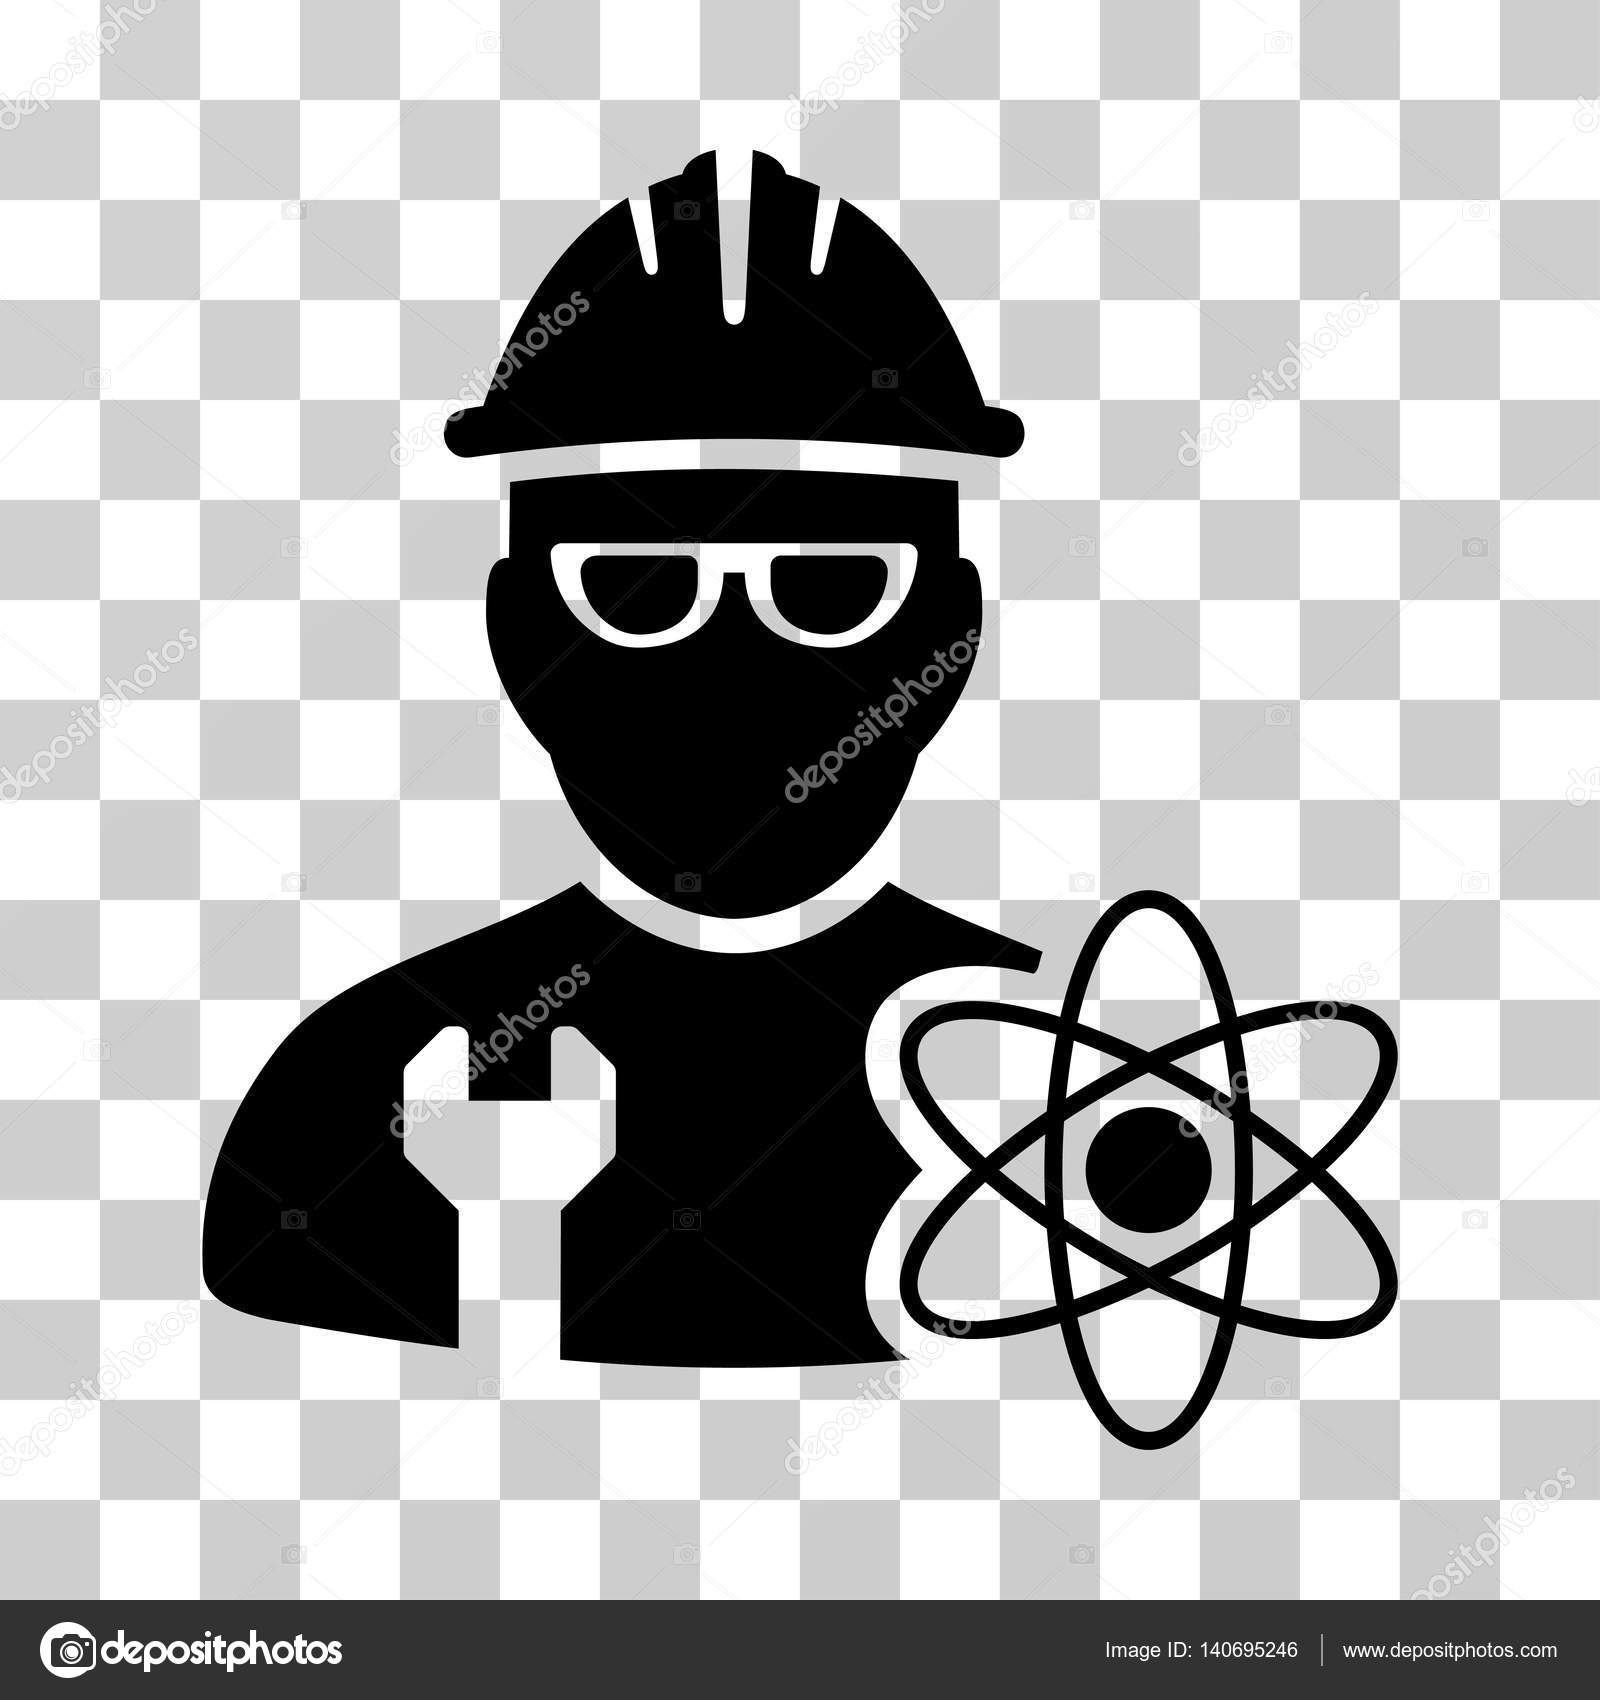 22+ Scientist Vector Black And White